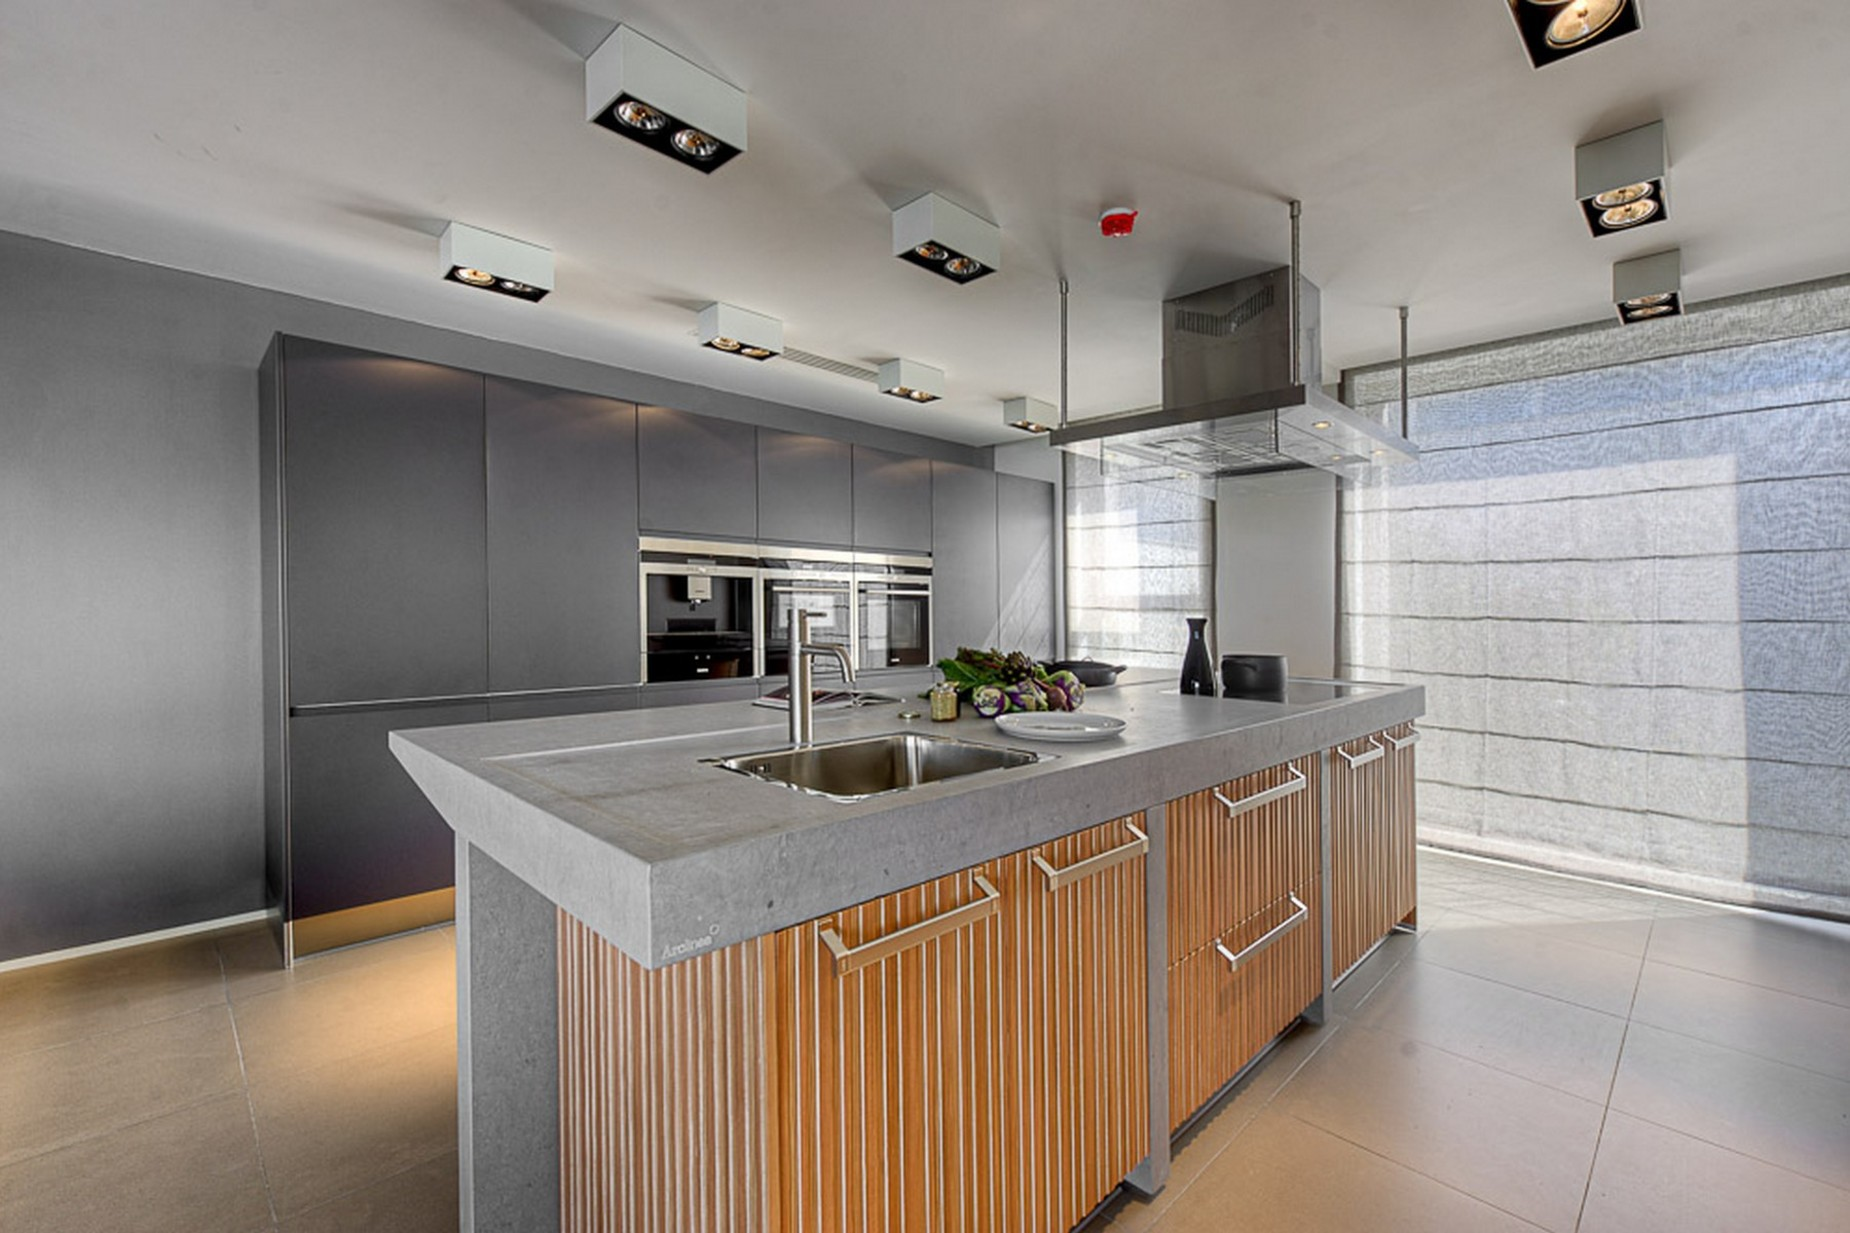 3 bed Villa For Sale in Bahar ic-Caghaq, Bahar ic-Caghaq - thumb 9